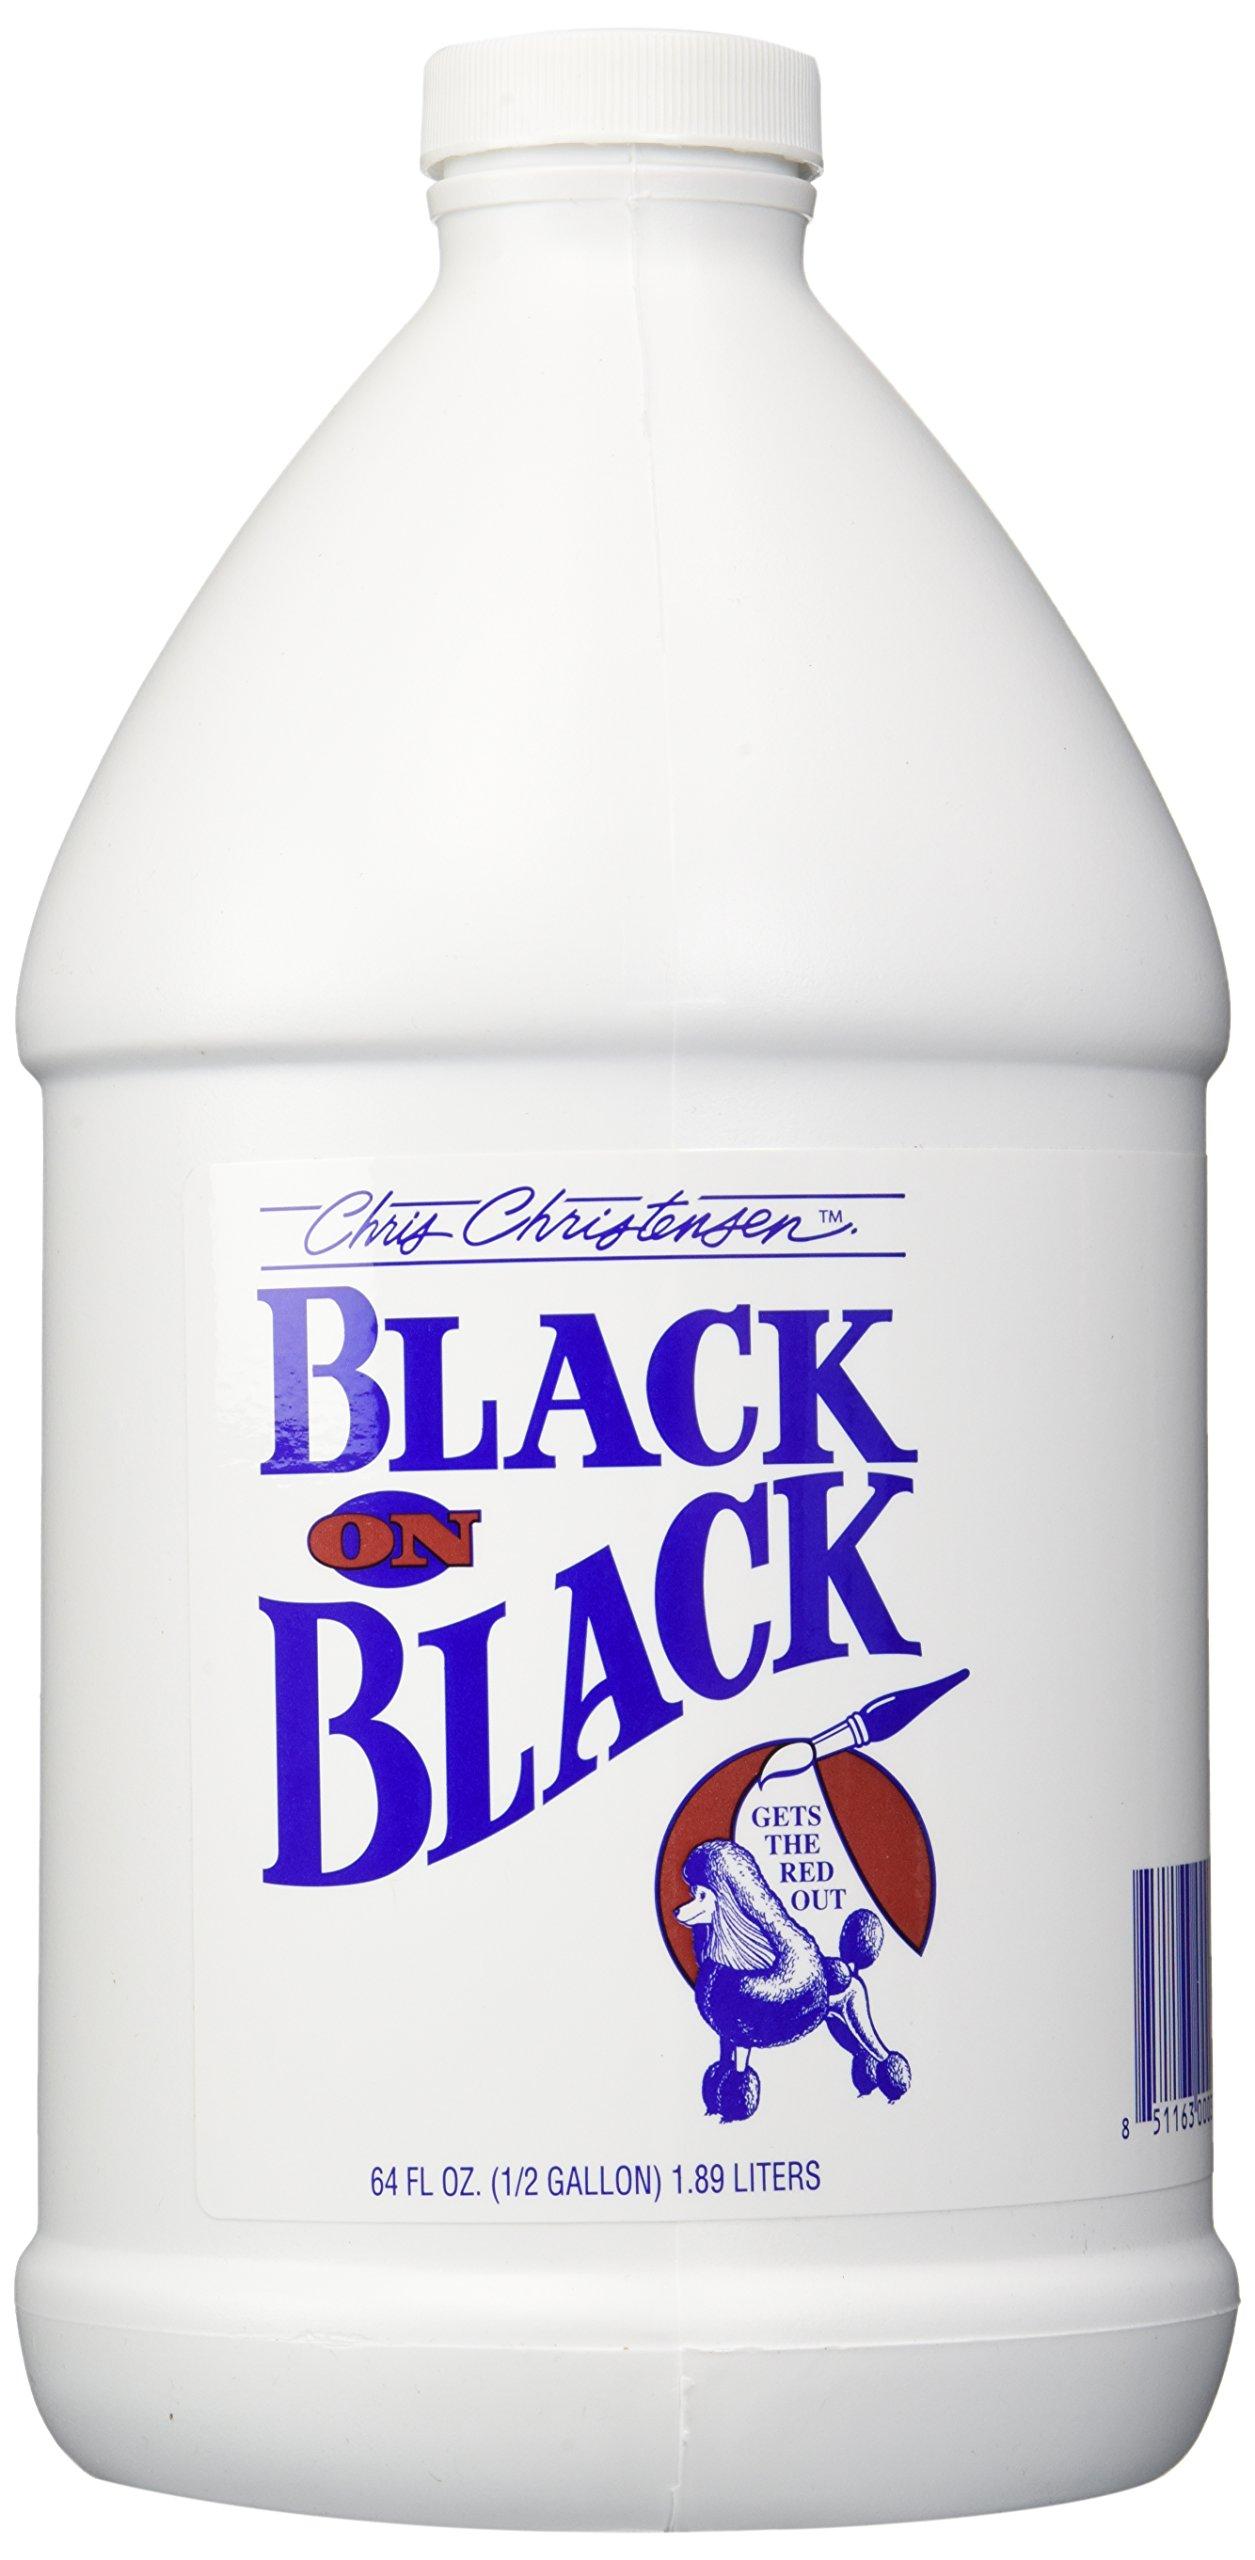 Black On Black Shampoo 64 oz by Chris Christensen